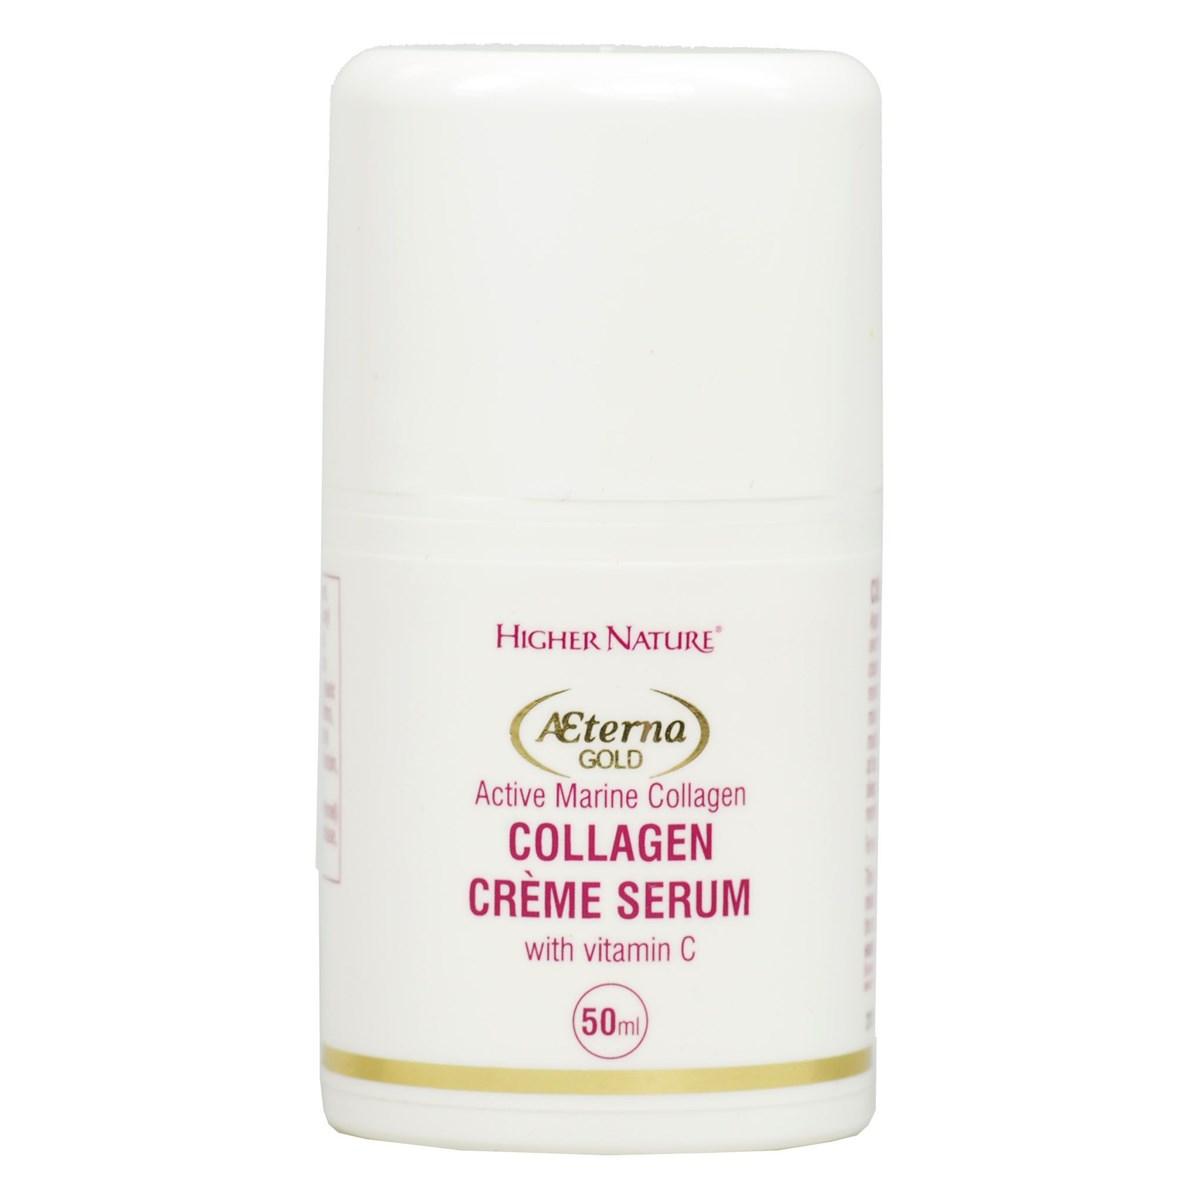 Higher Nature Æterna Gold Collagen Crème Serum